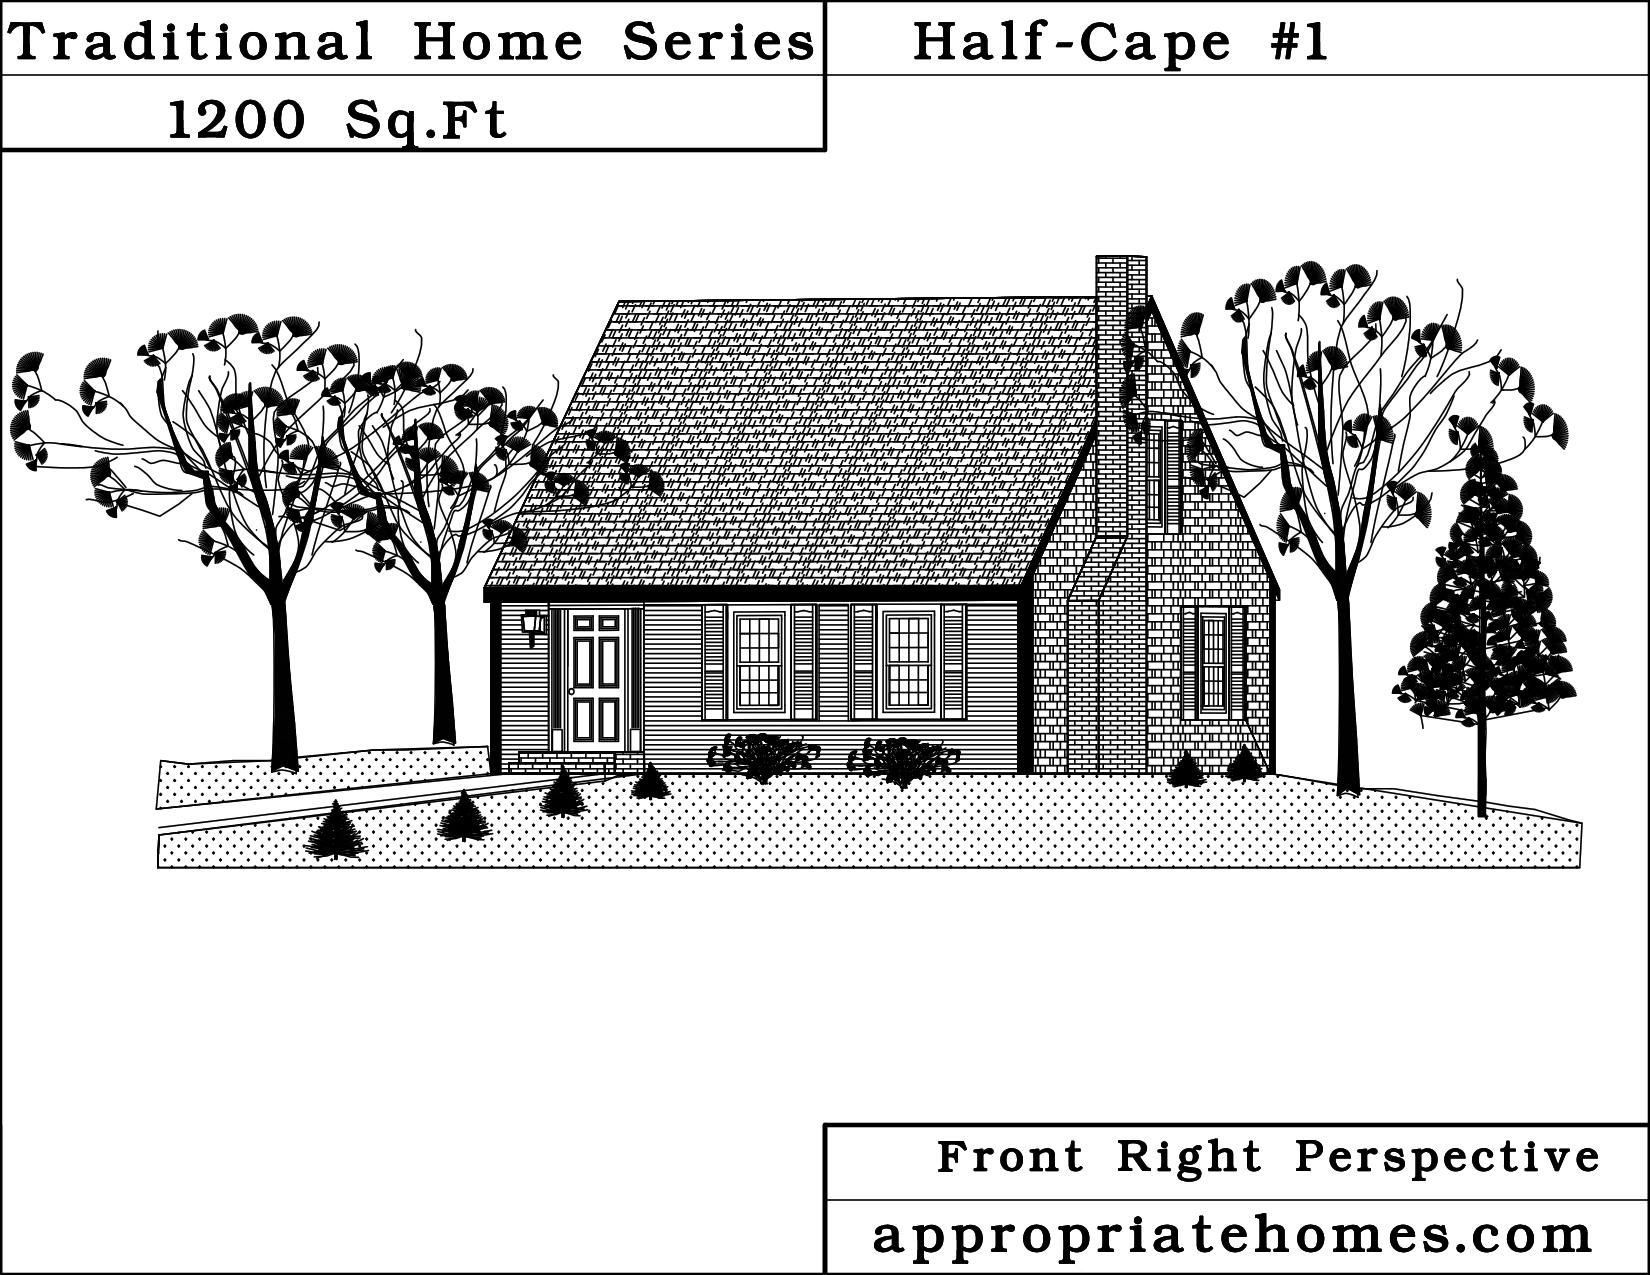 Cape Cod Home Design Half Cape Style House Plans